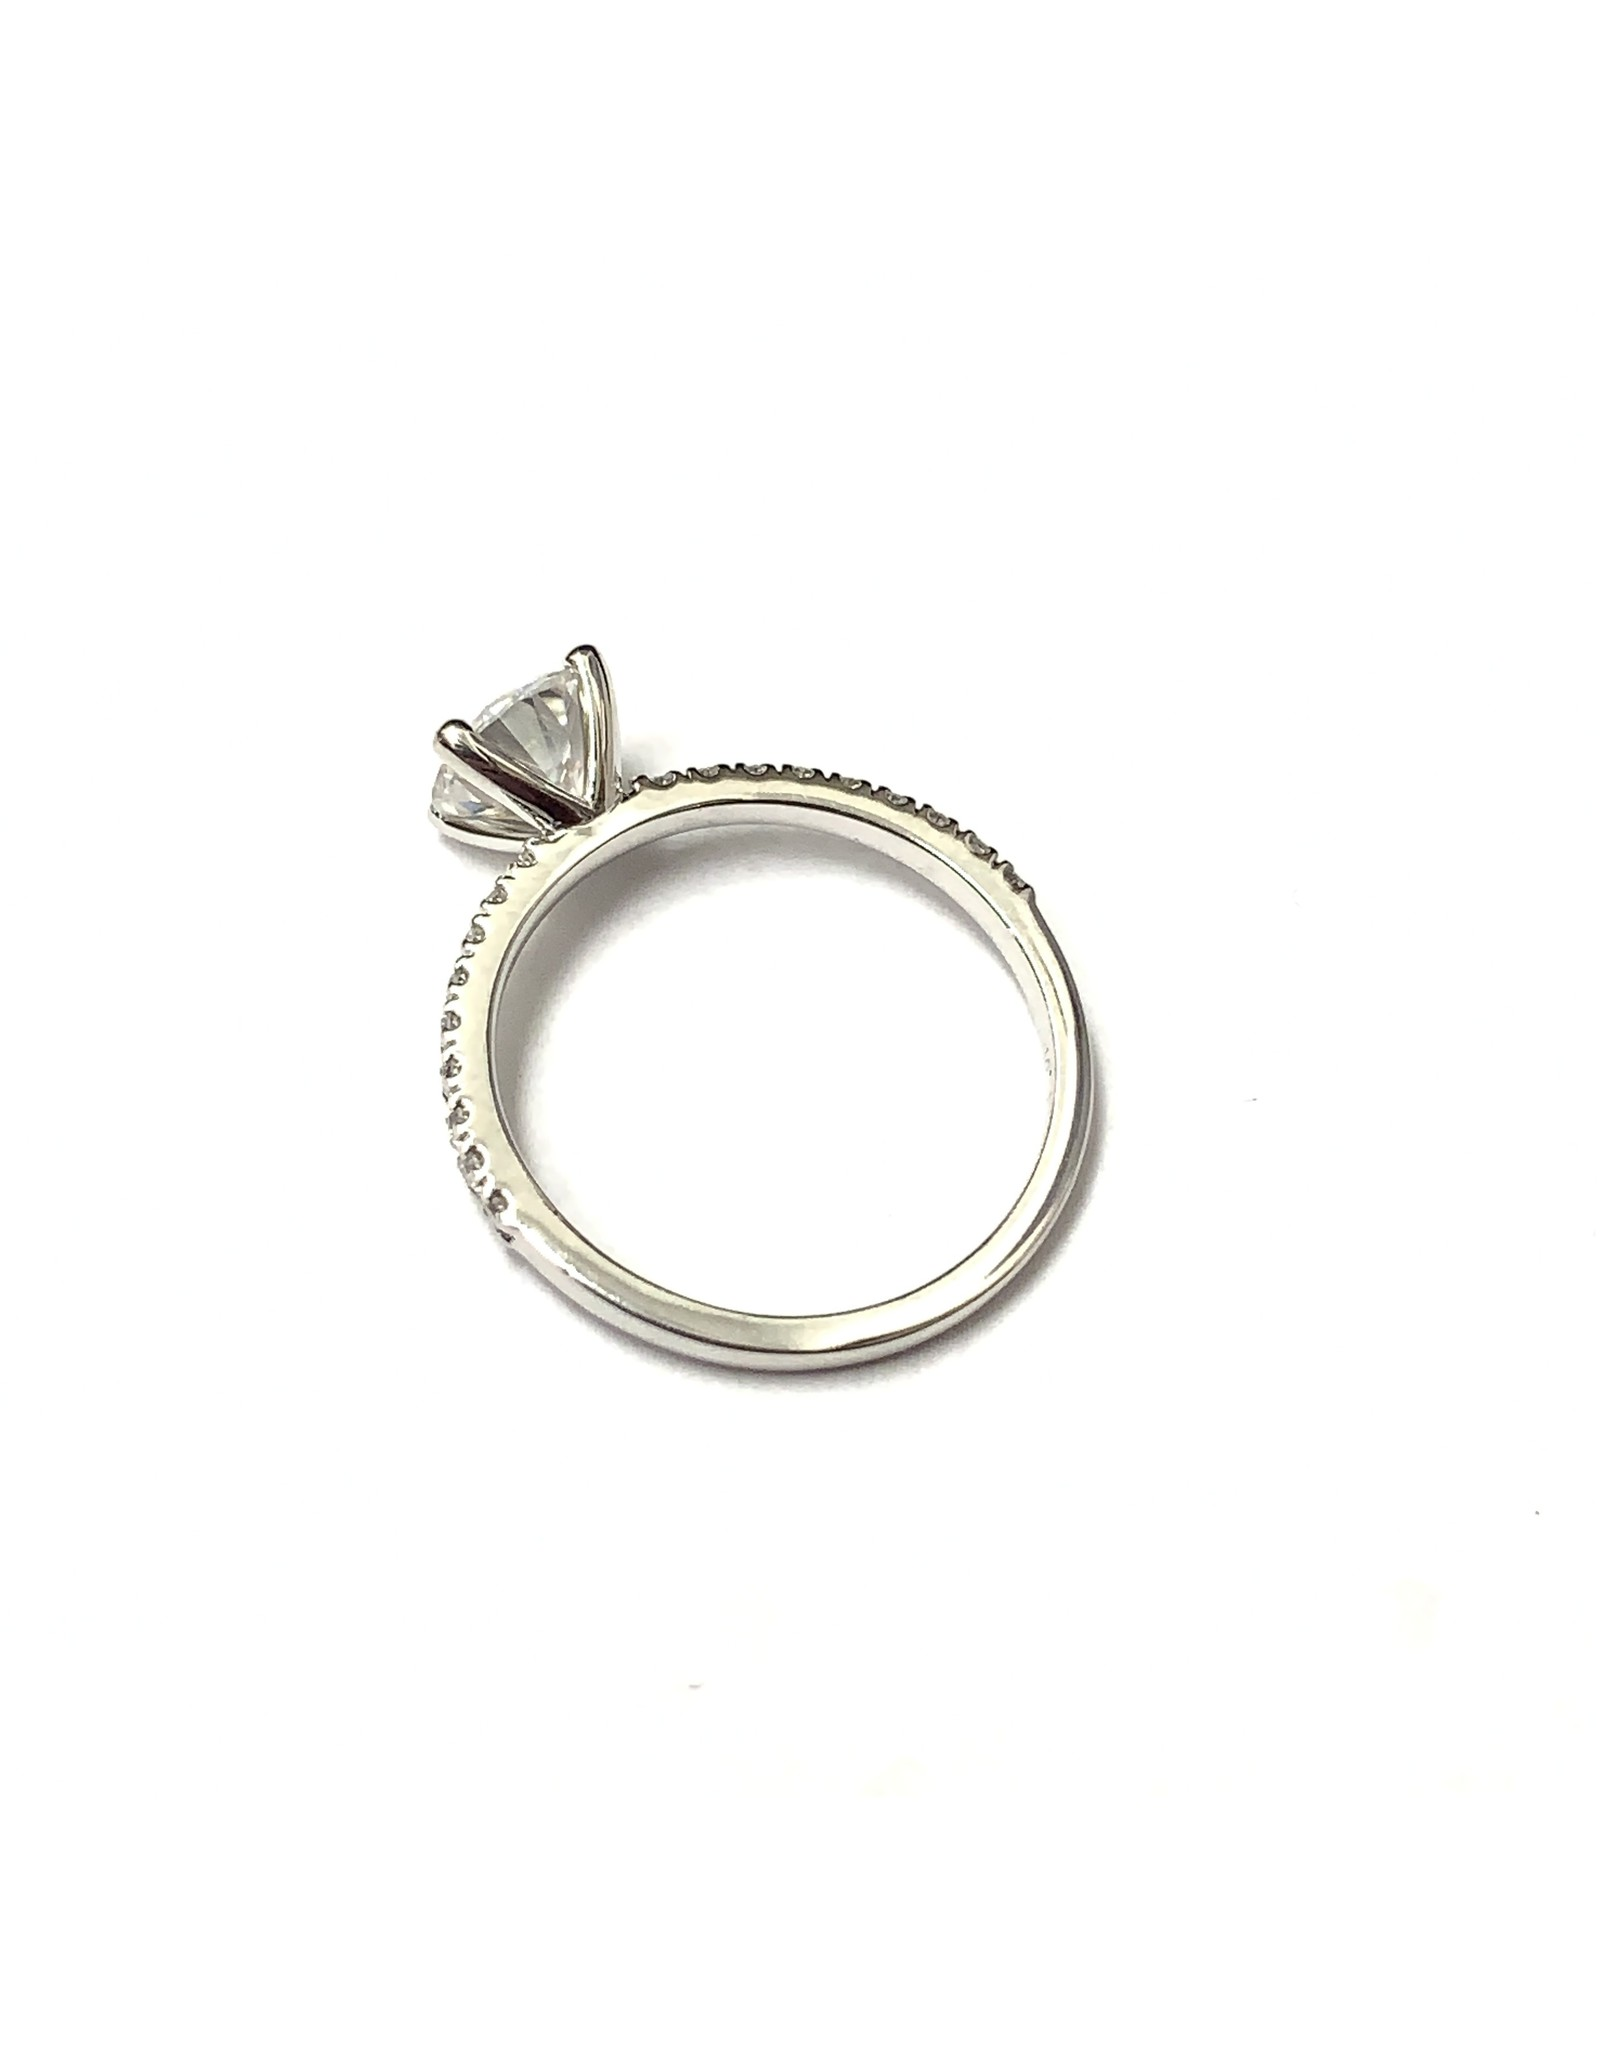 6.5mm Moissanite & Lab Diamond Ring 14KW